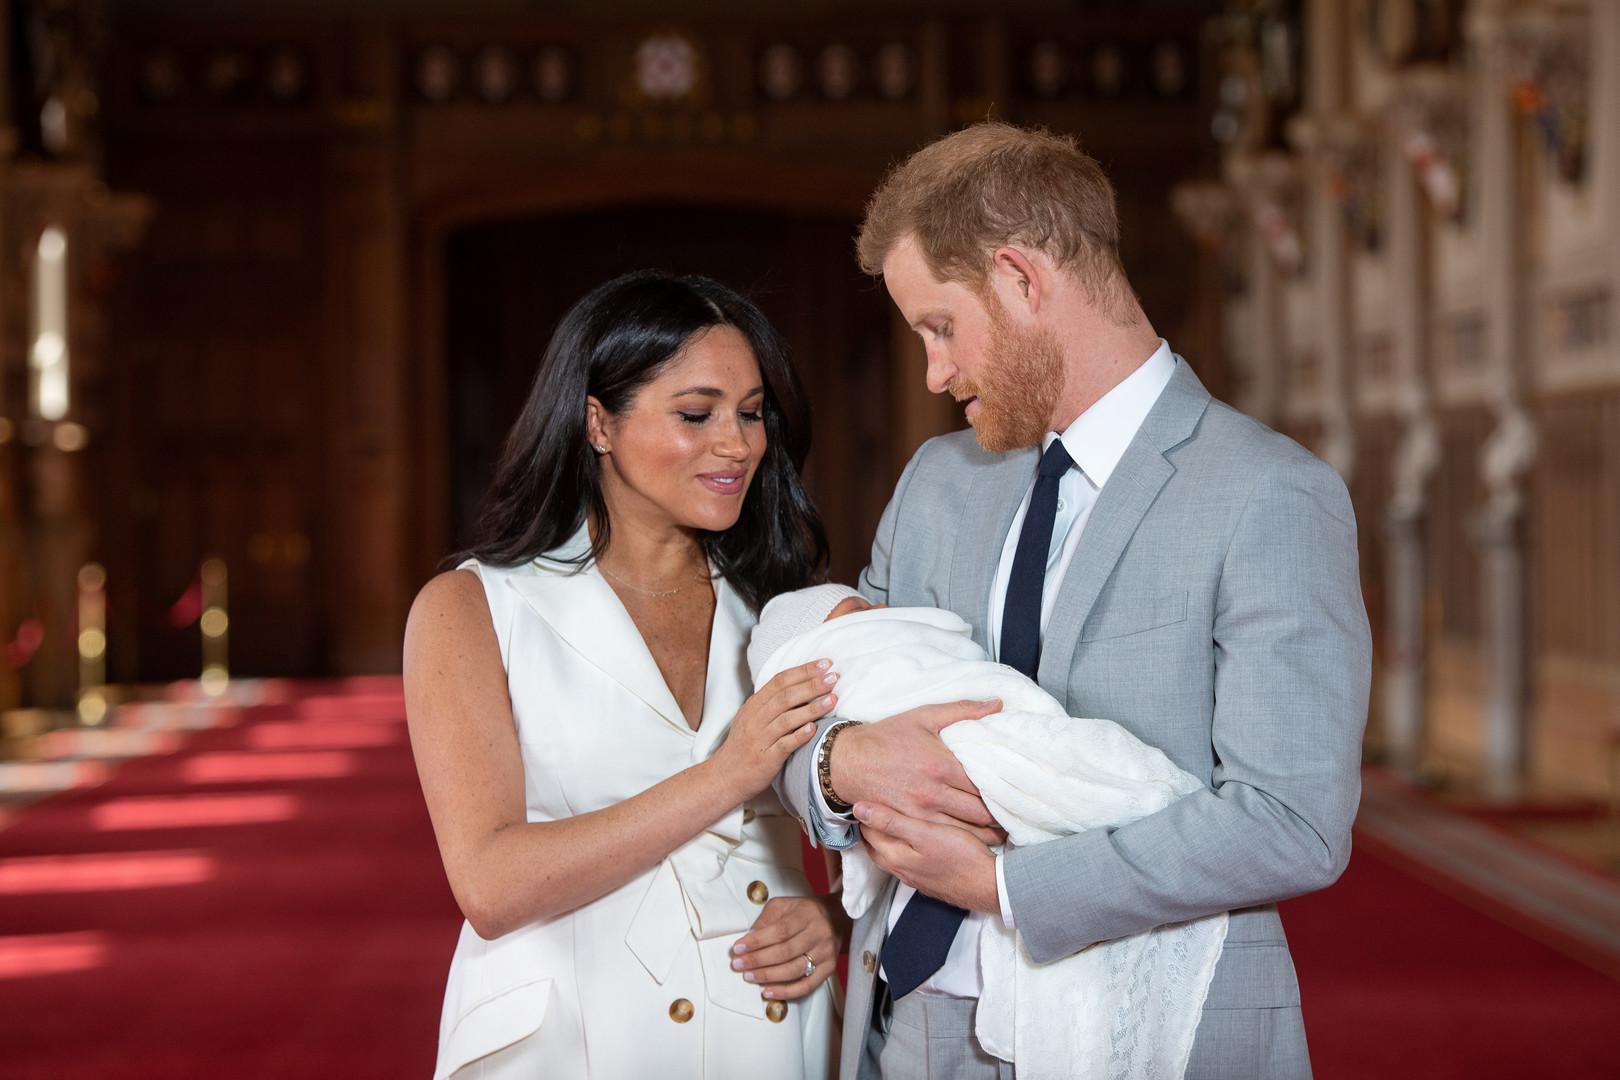 الأمير هاري وزوجته ميغان ونجلهما آرتشي، 8/05/2019